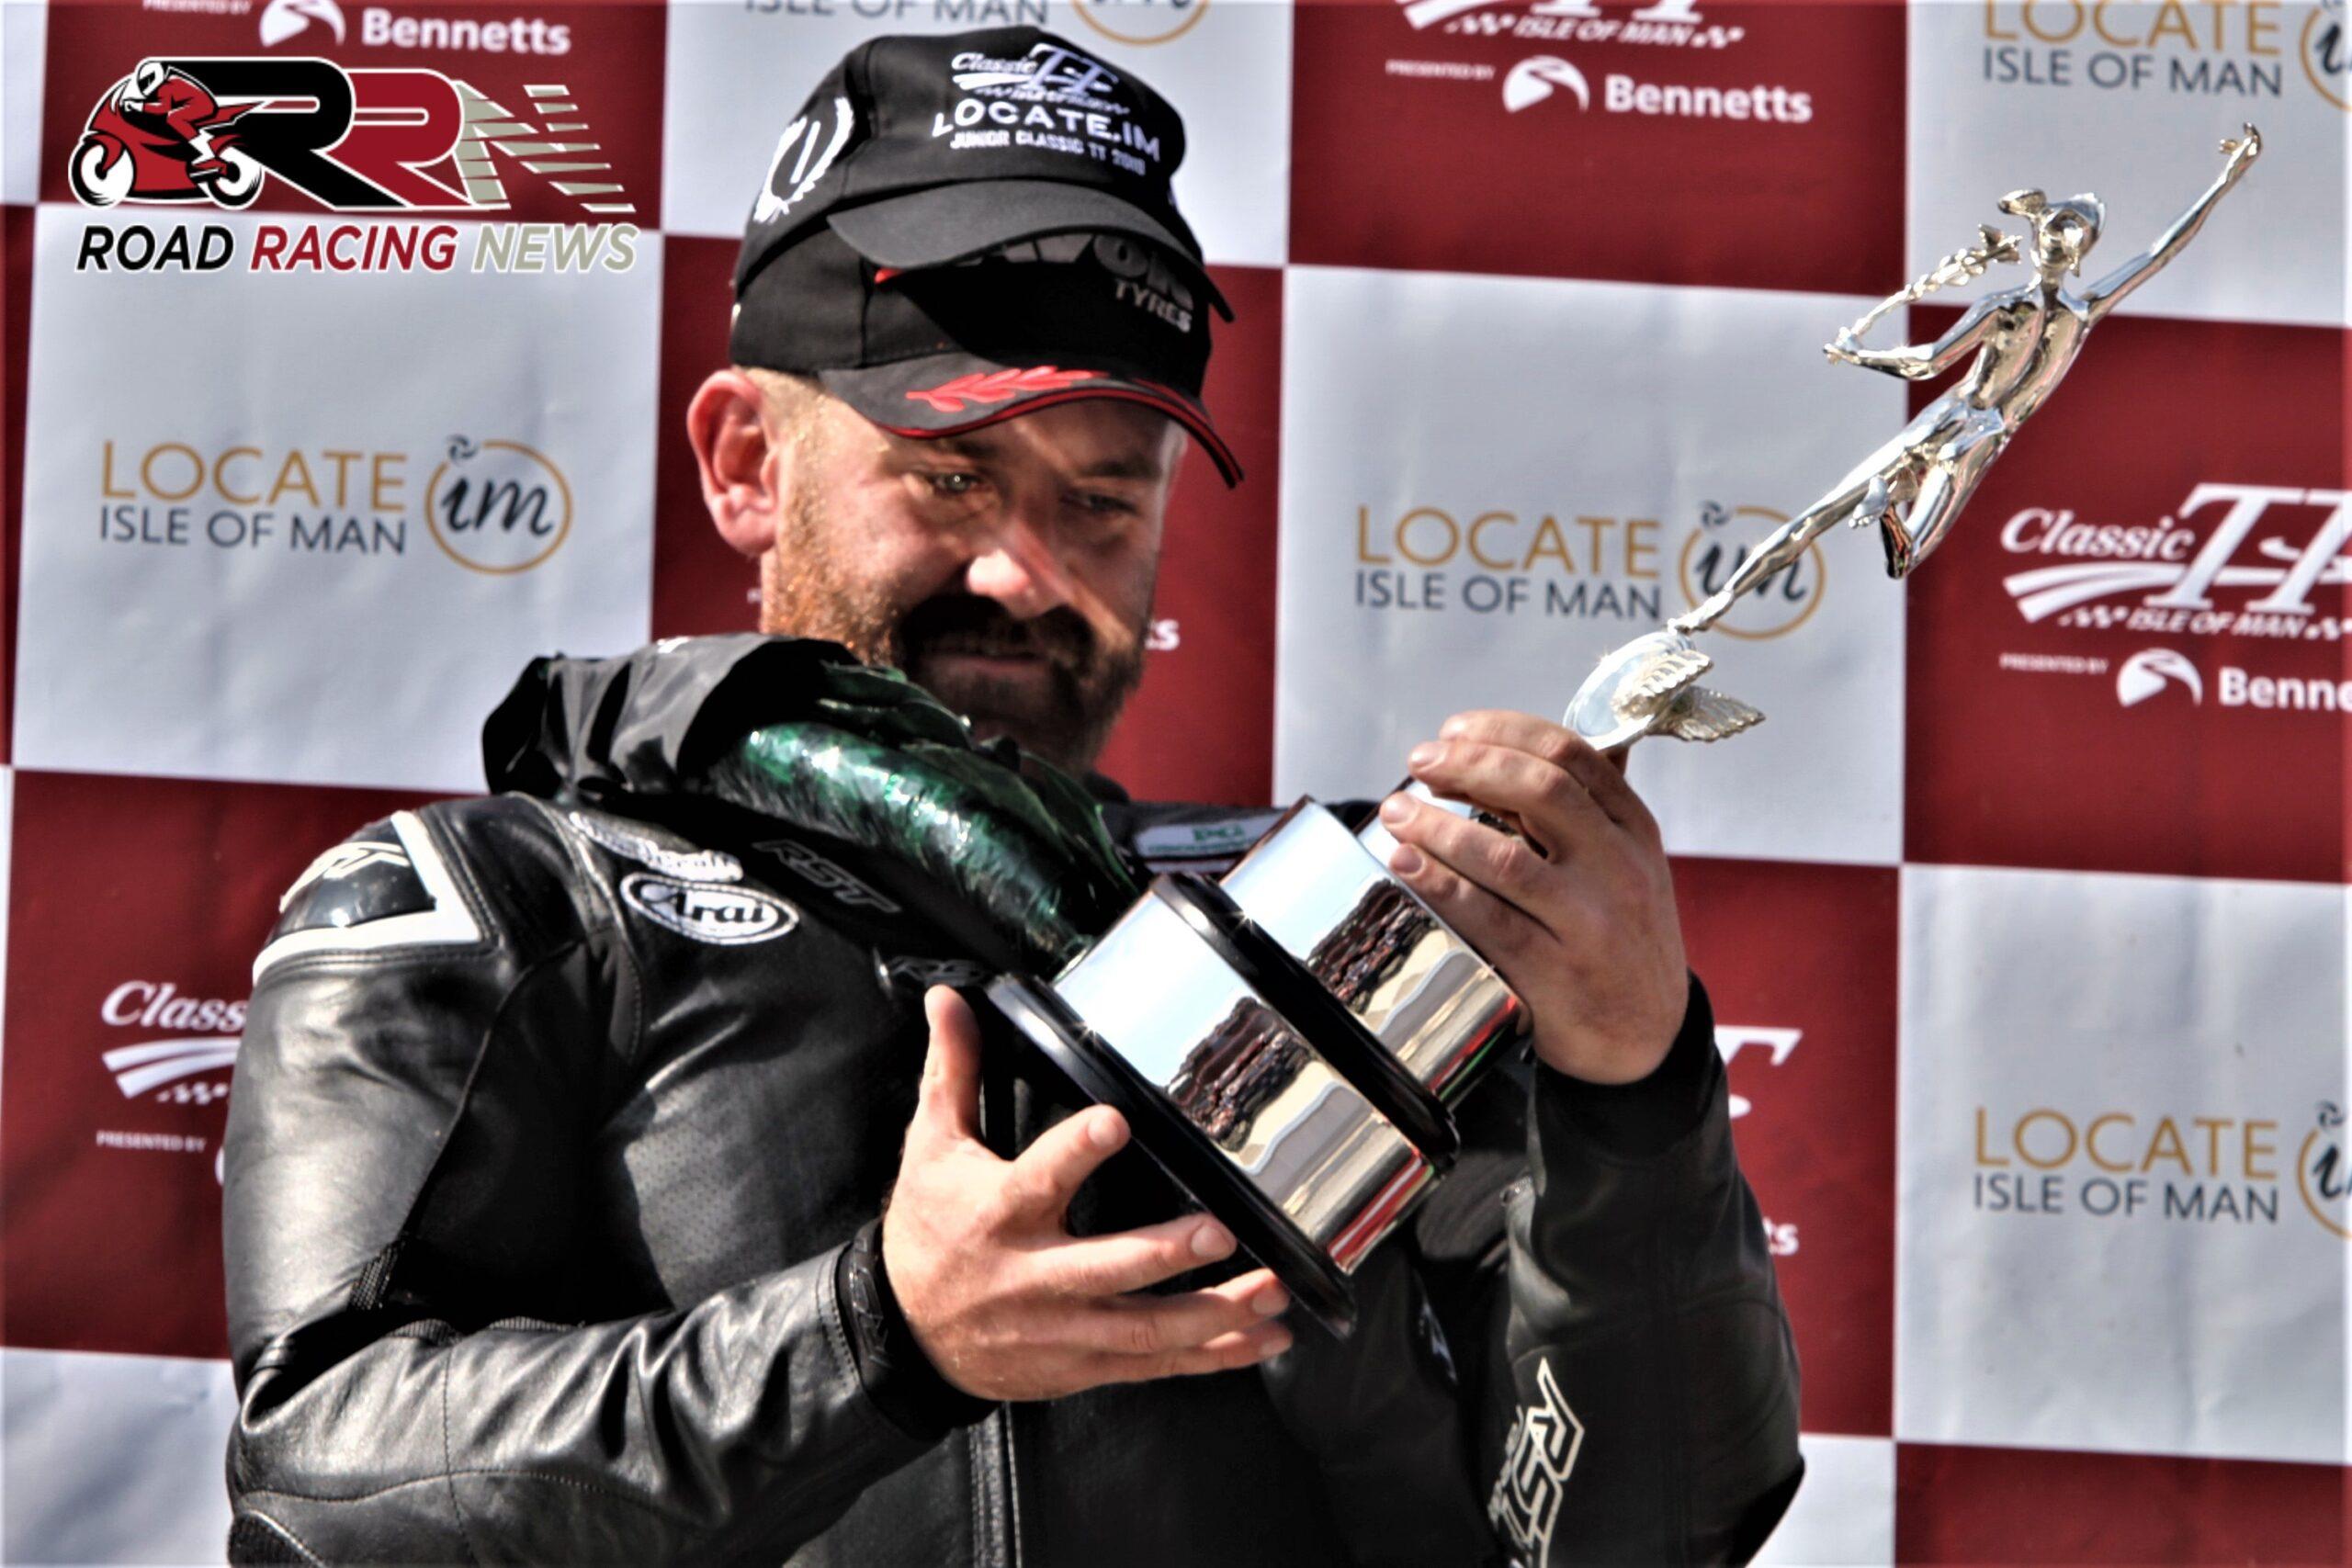 Finally A Classic TT Champion – Coward Scoops Locate.im Junior Race Victory